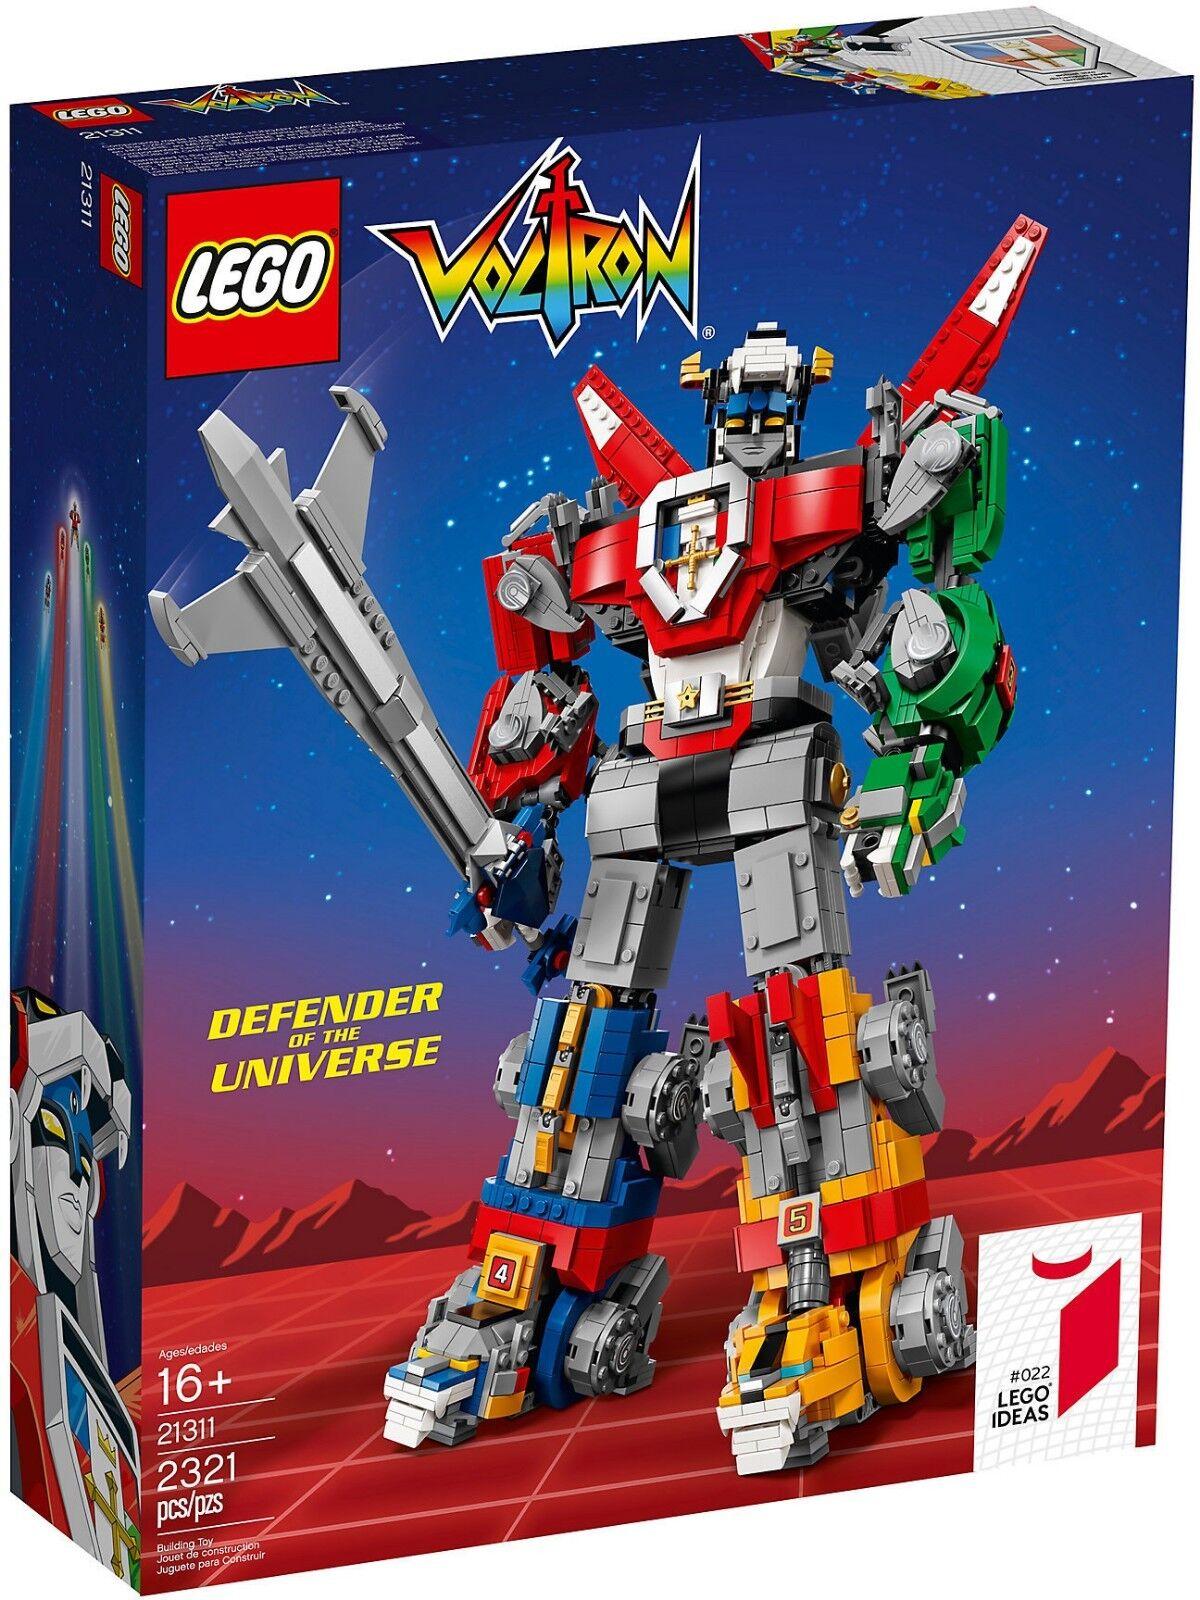 LEGO Ideas 21311 - Voltron NEW